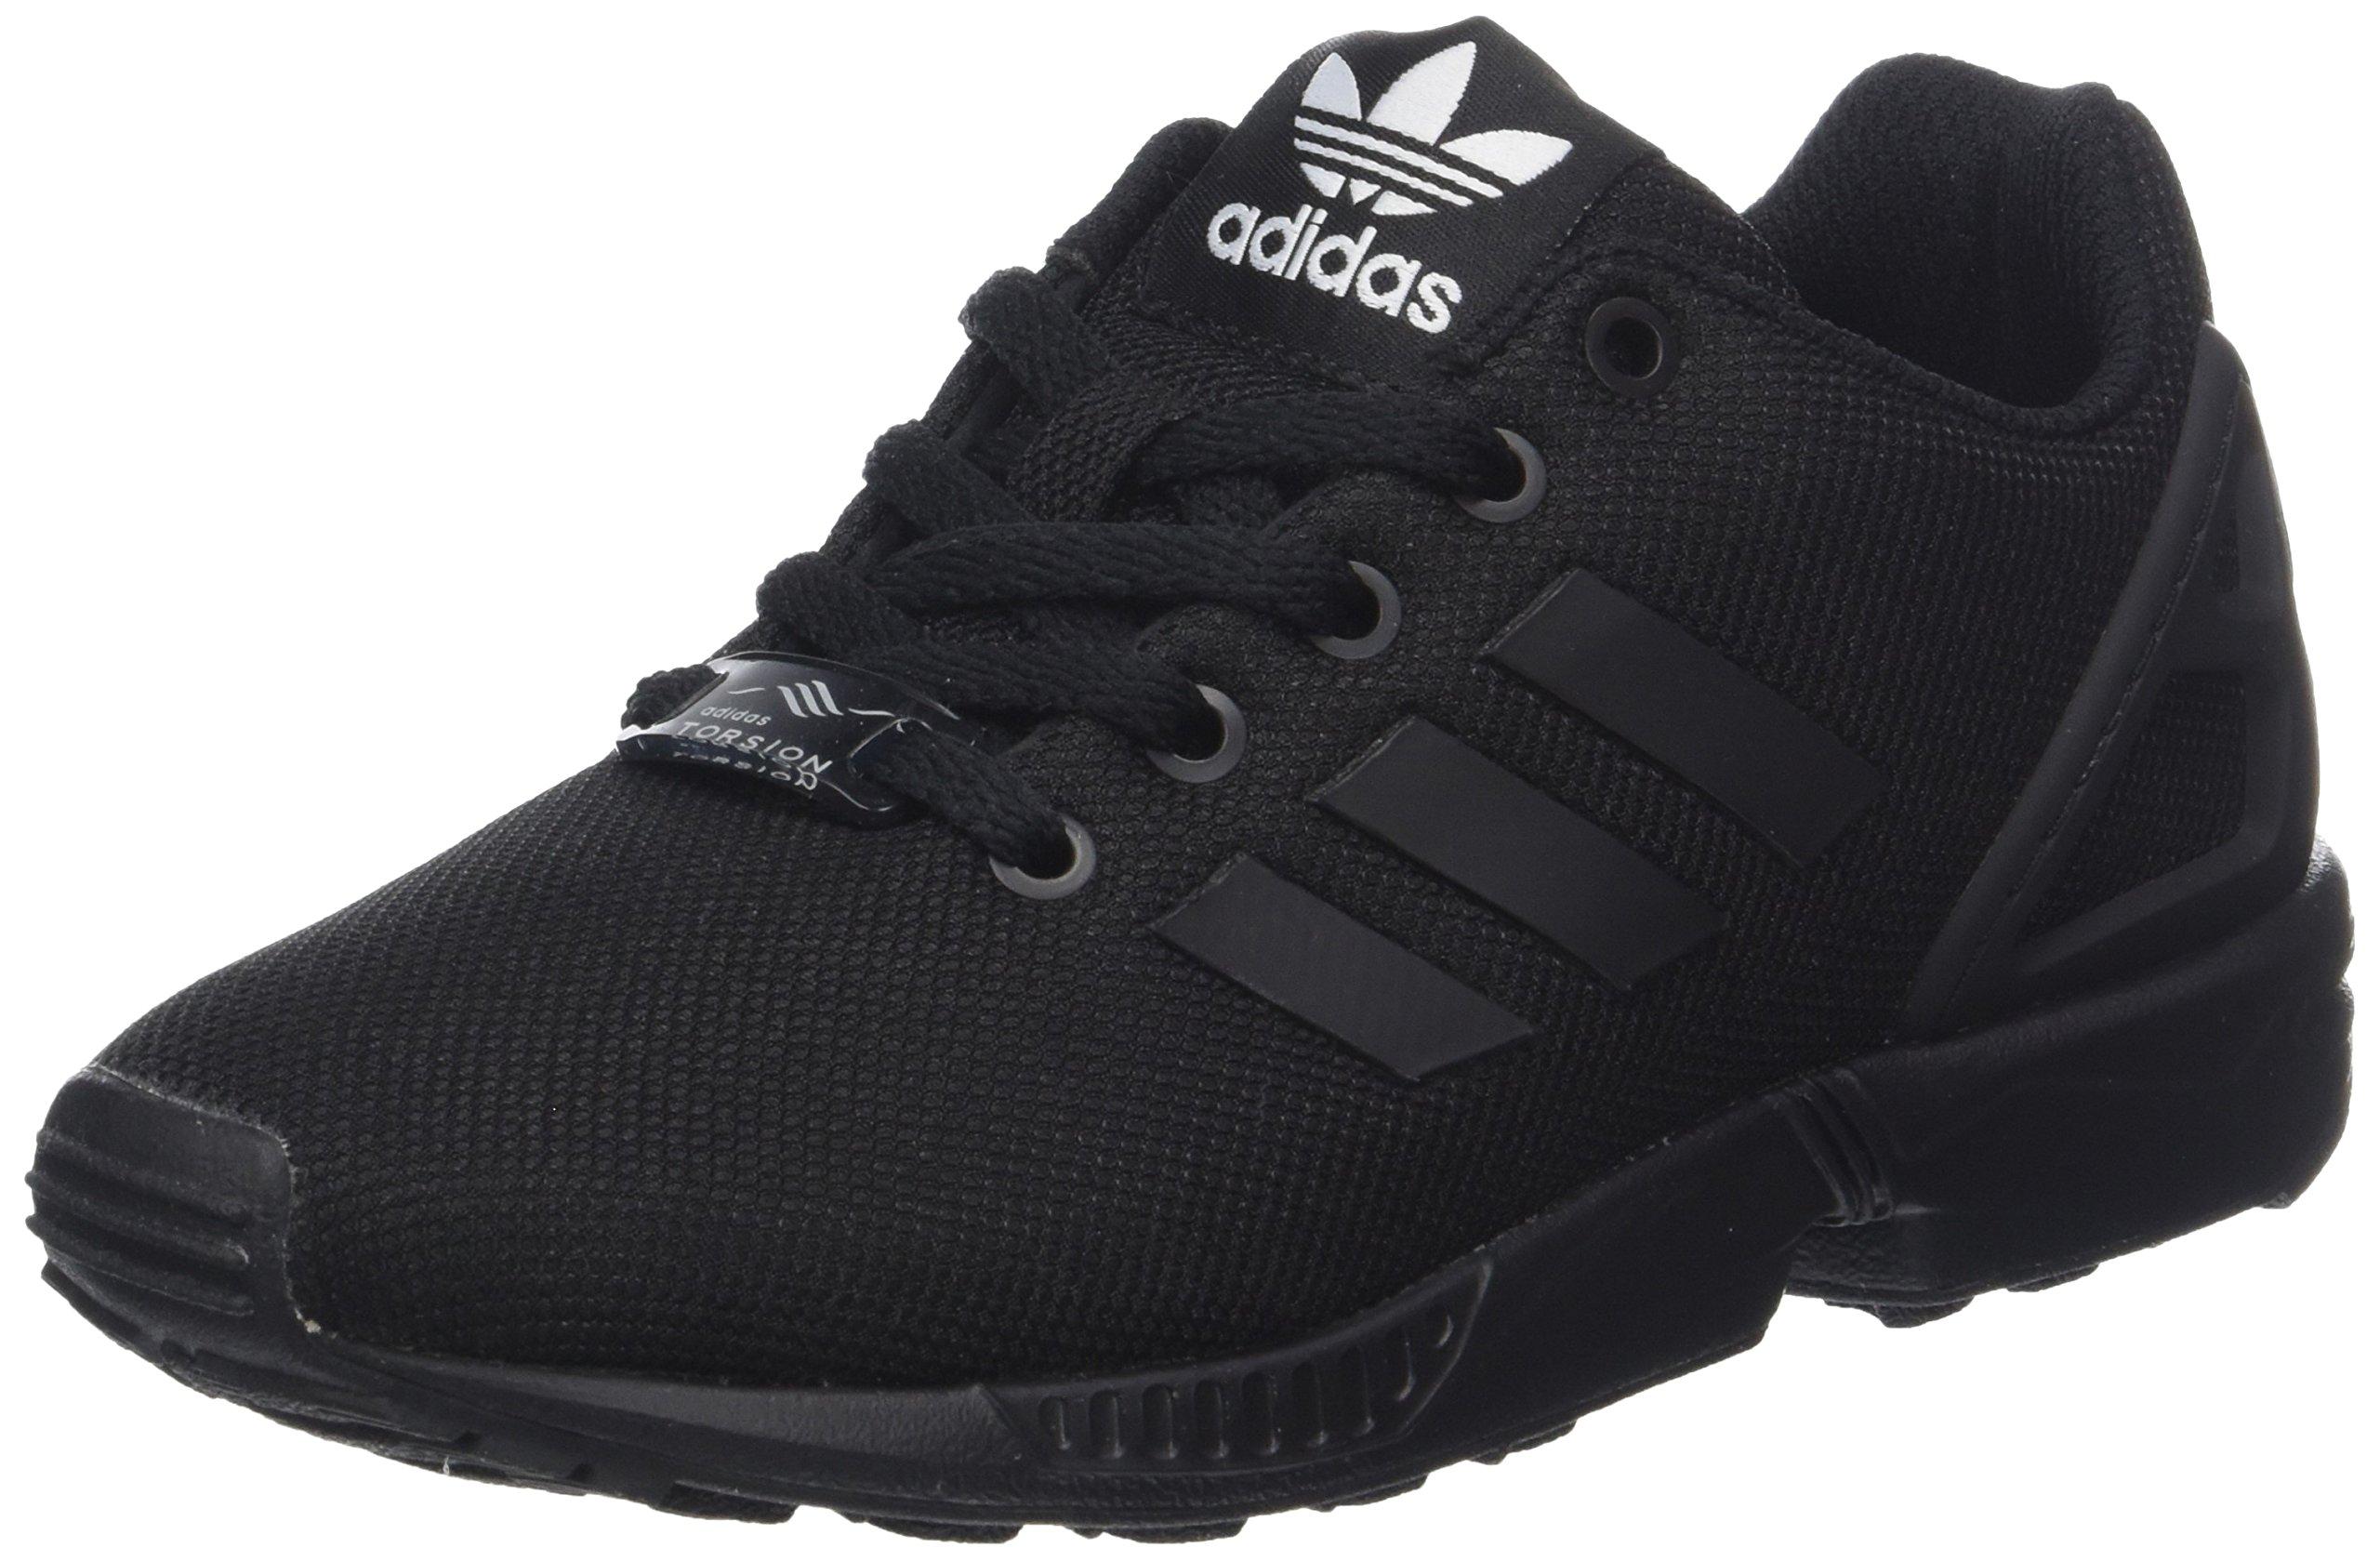 Adidas Scarpe ragazzi Scarpe da ginnastica Comprare Ora